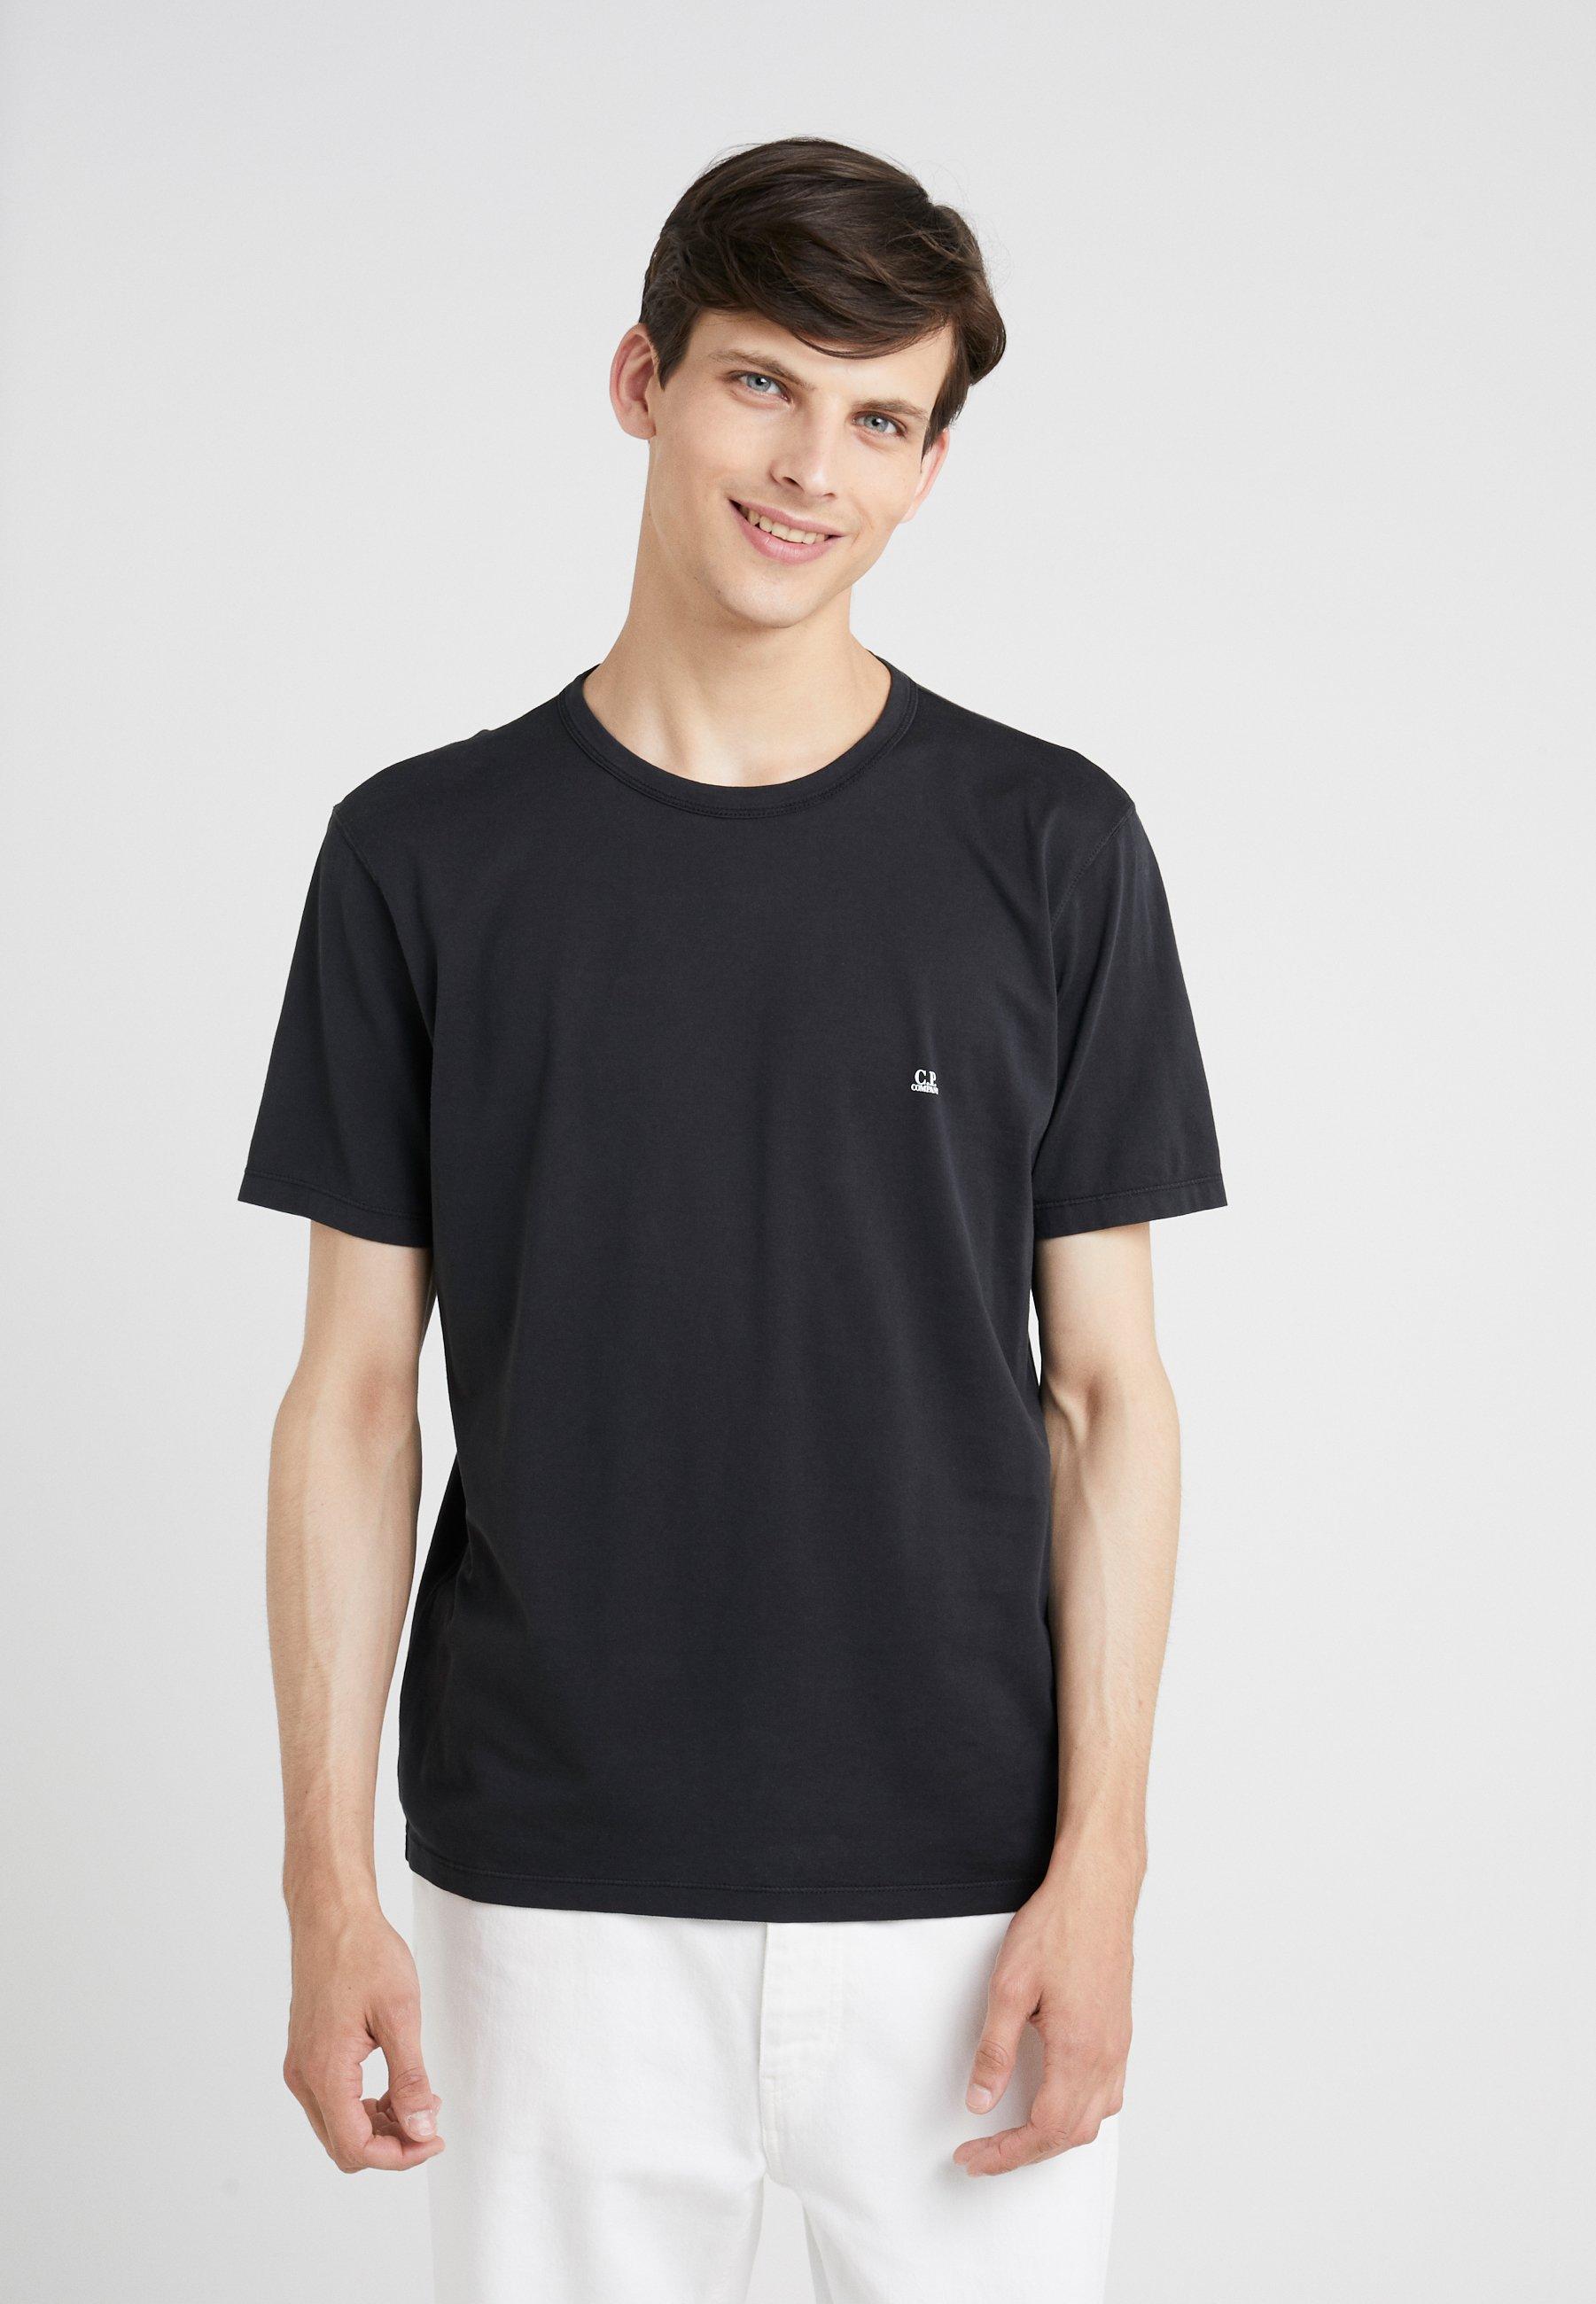 SleeveT C shirt Basique Short pCompany Black Small Logo deCxWrBo